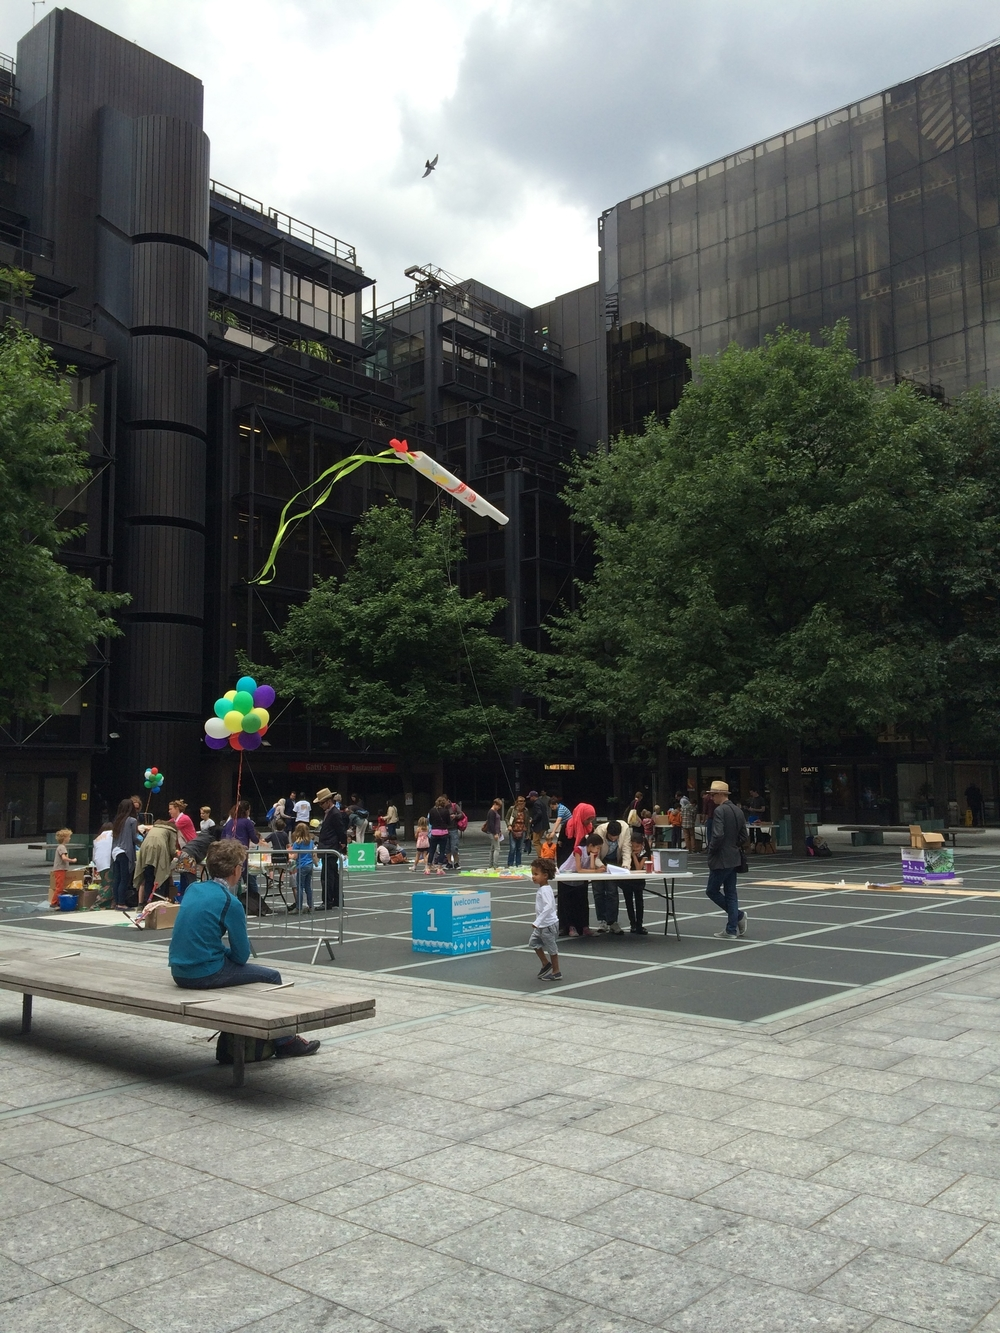 Photo 25-07-2015 15 13 09.jpg